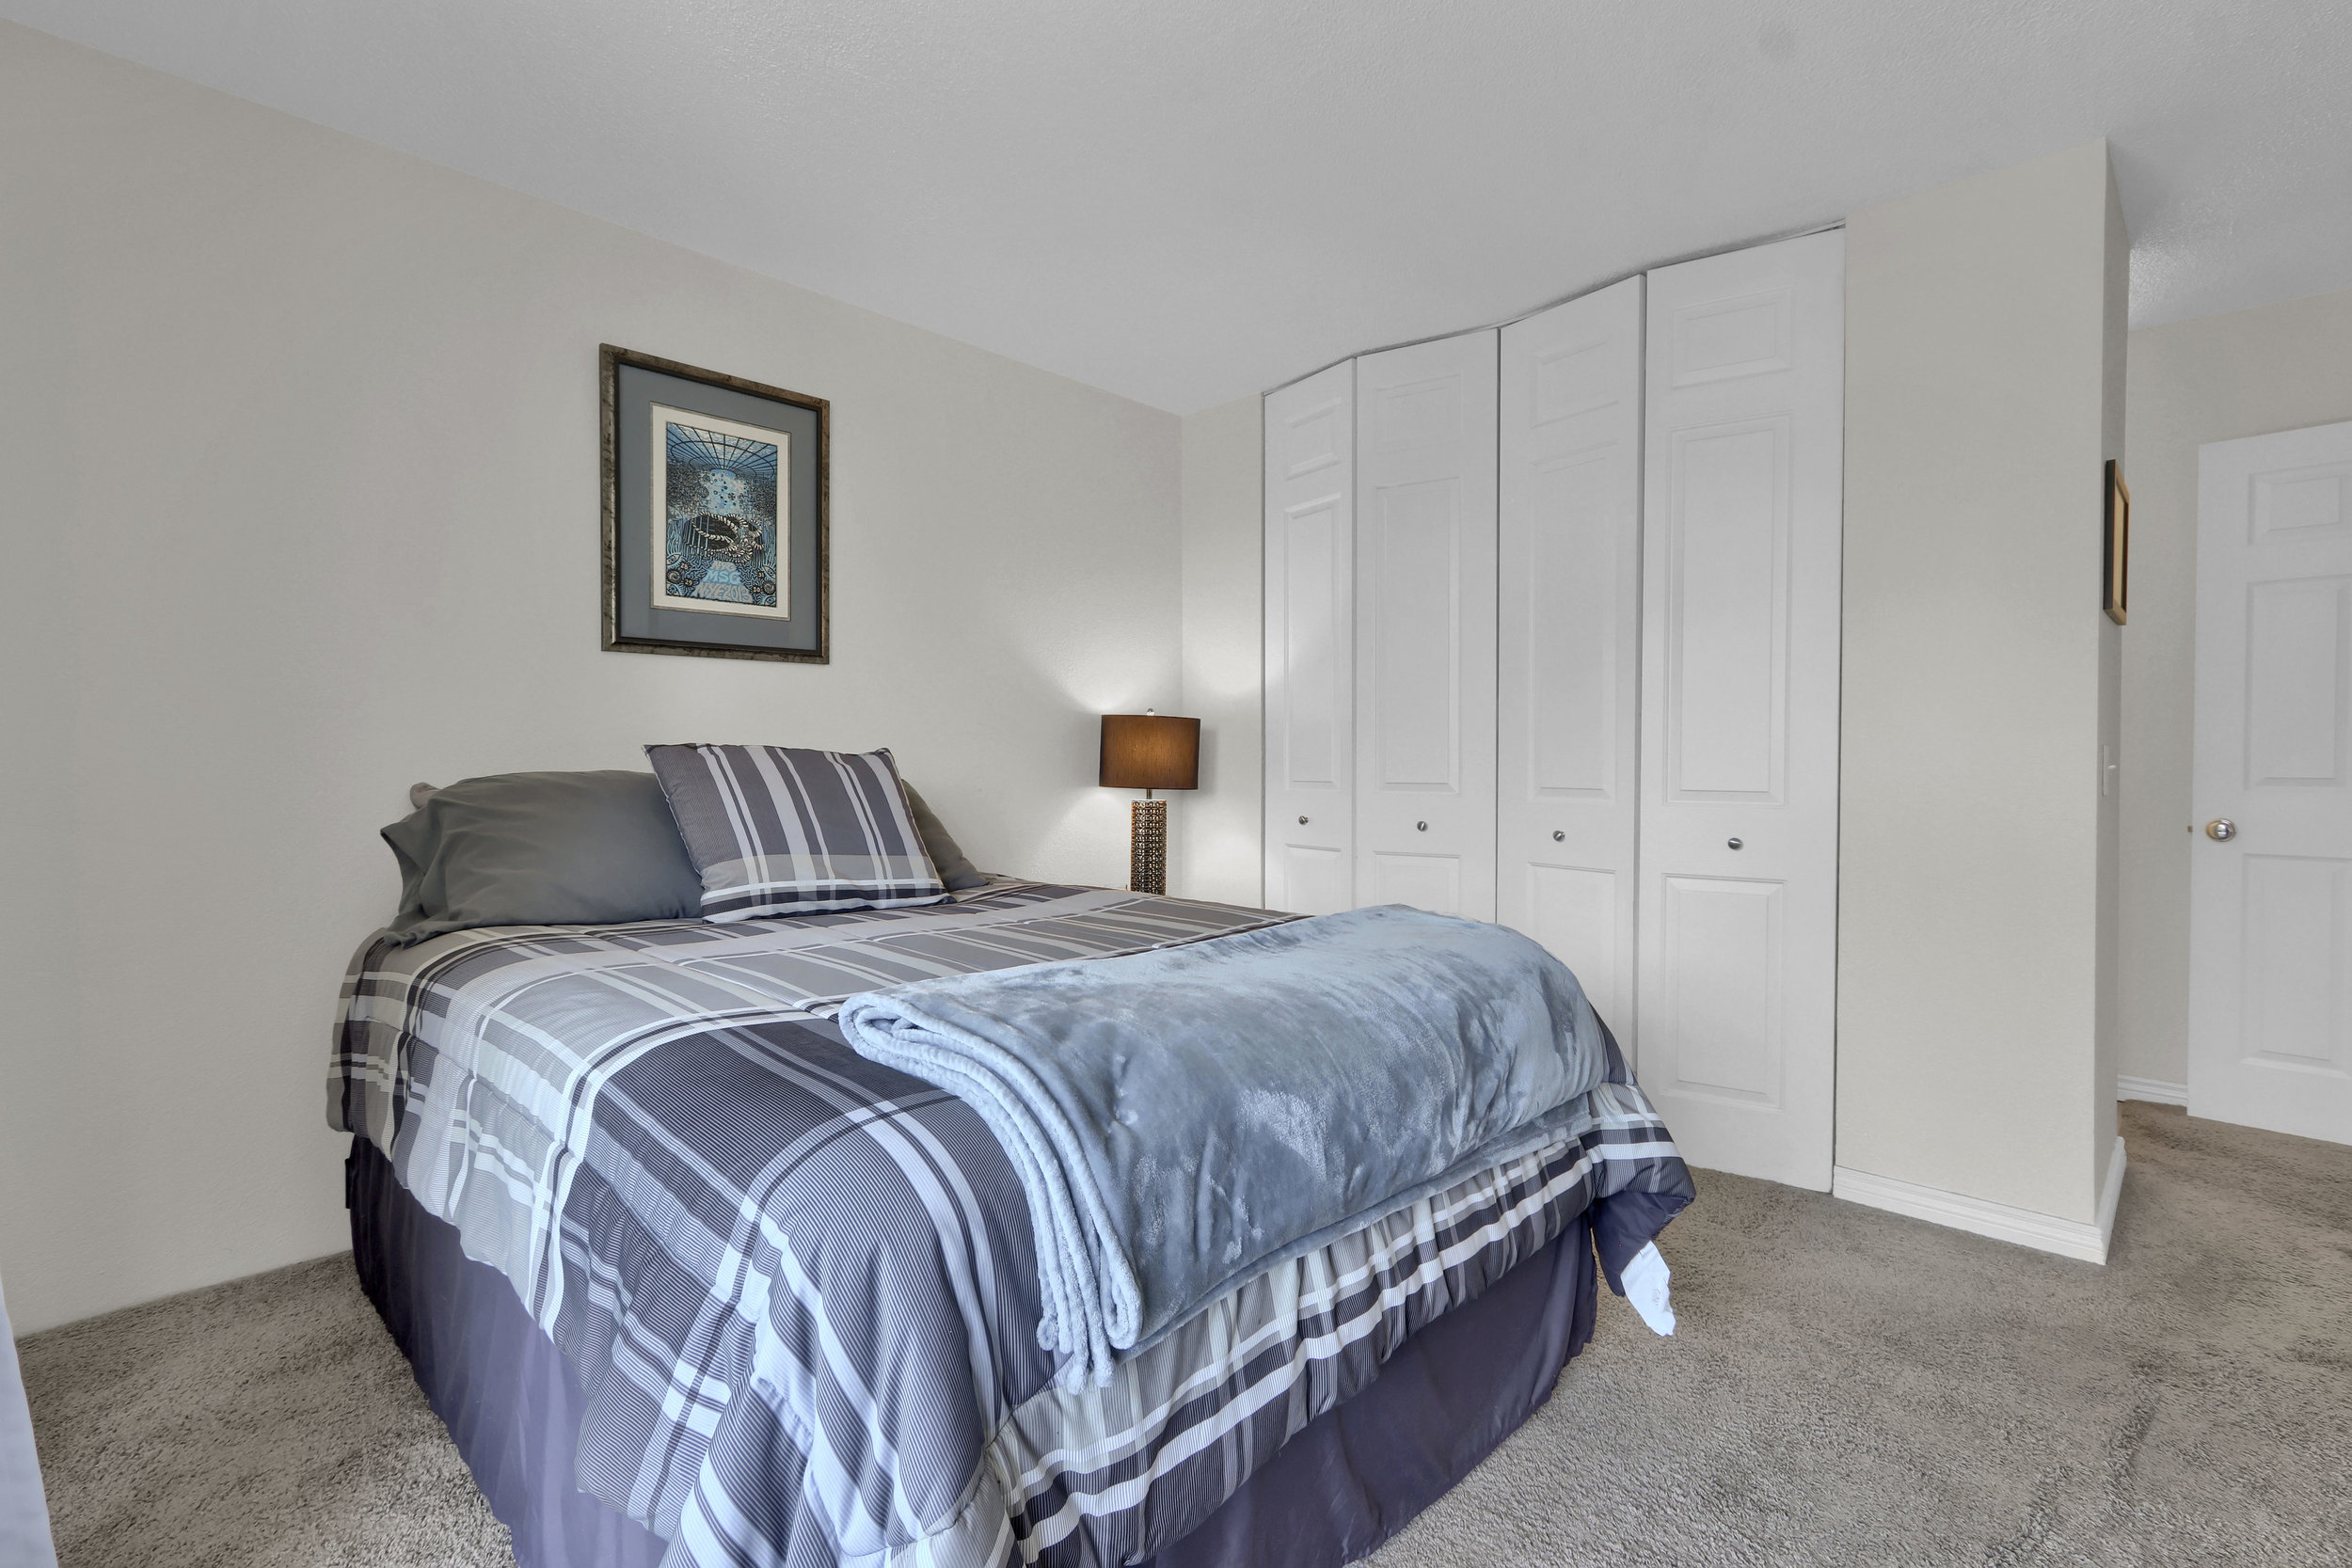 909 N Logan St Unit 3J Denver-print-014-015-Bedroom-4200x2800-300dpi.jpg